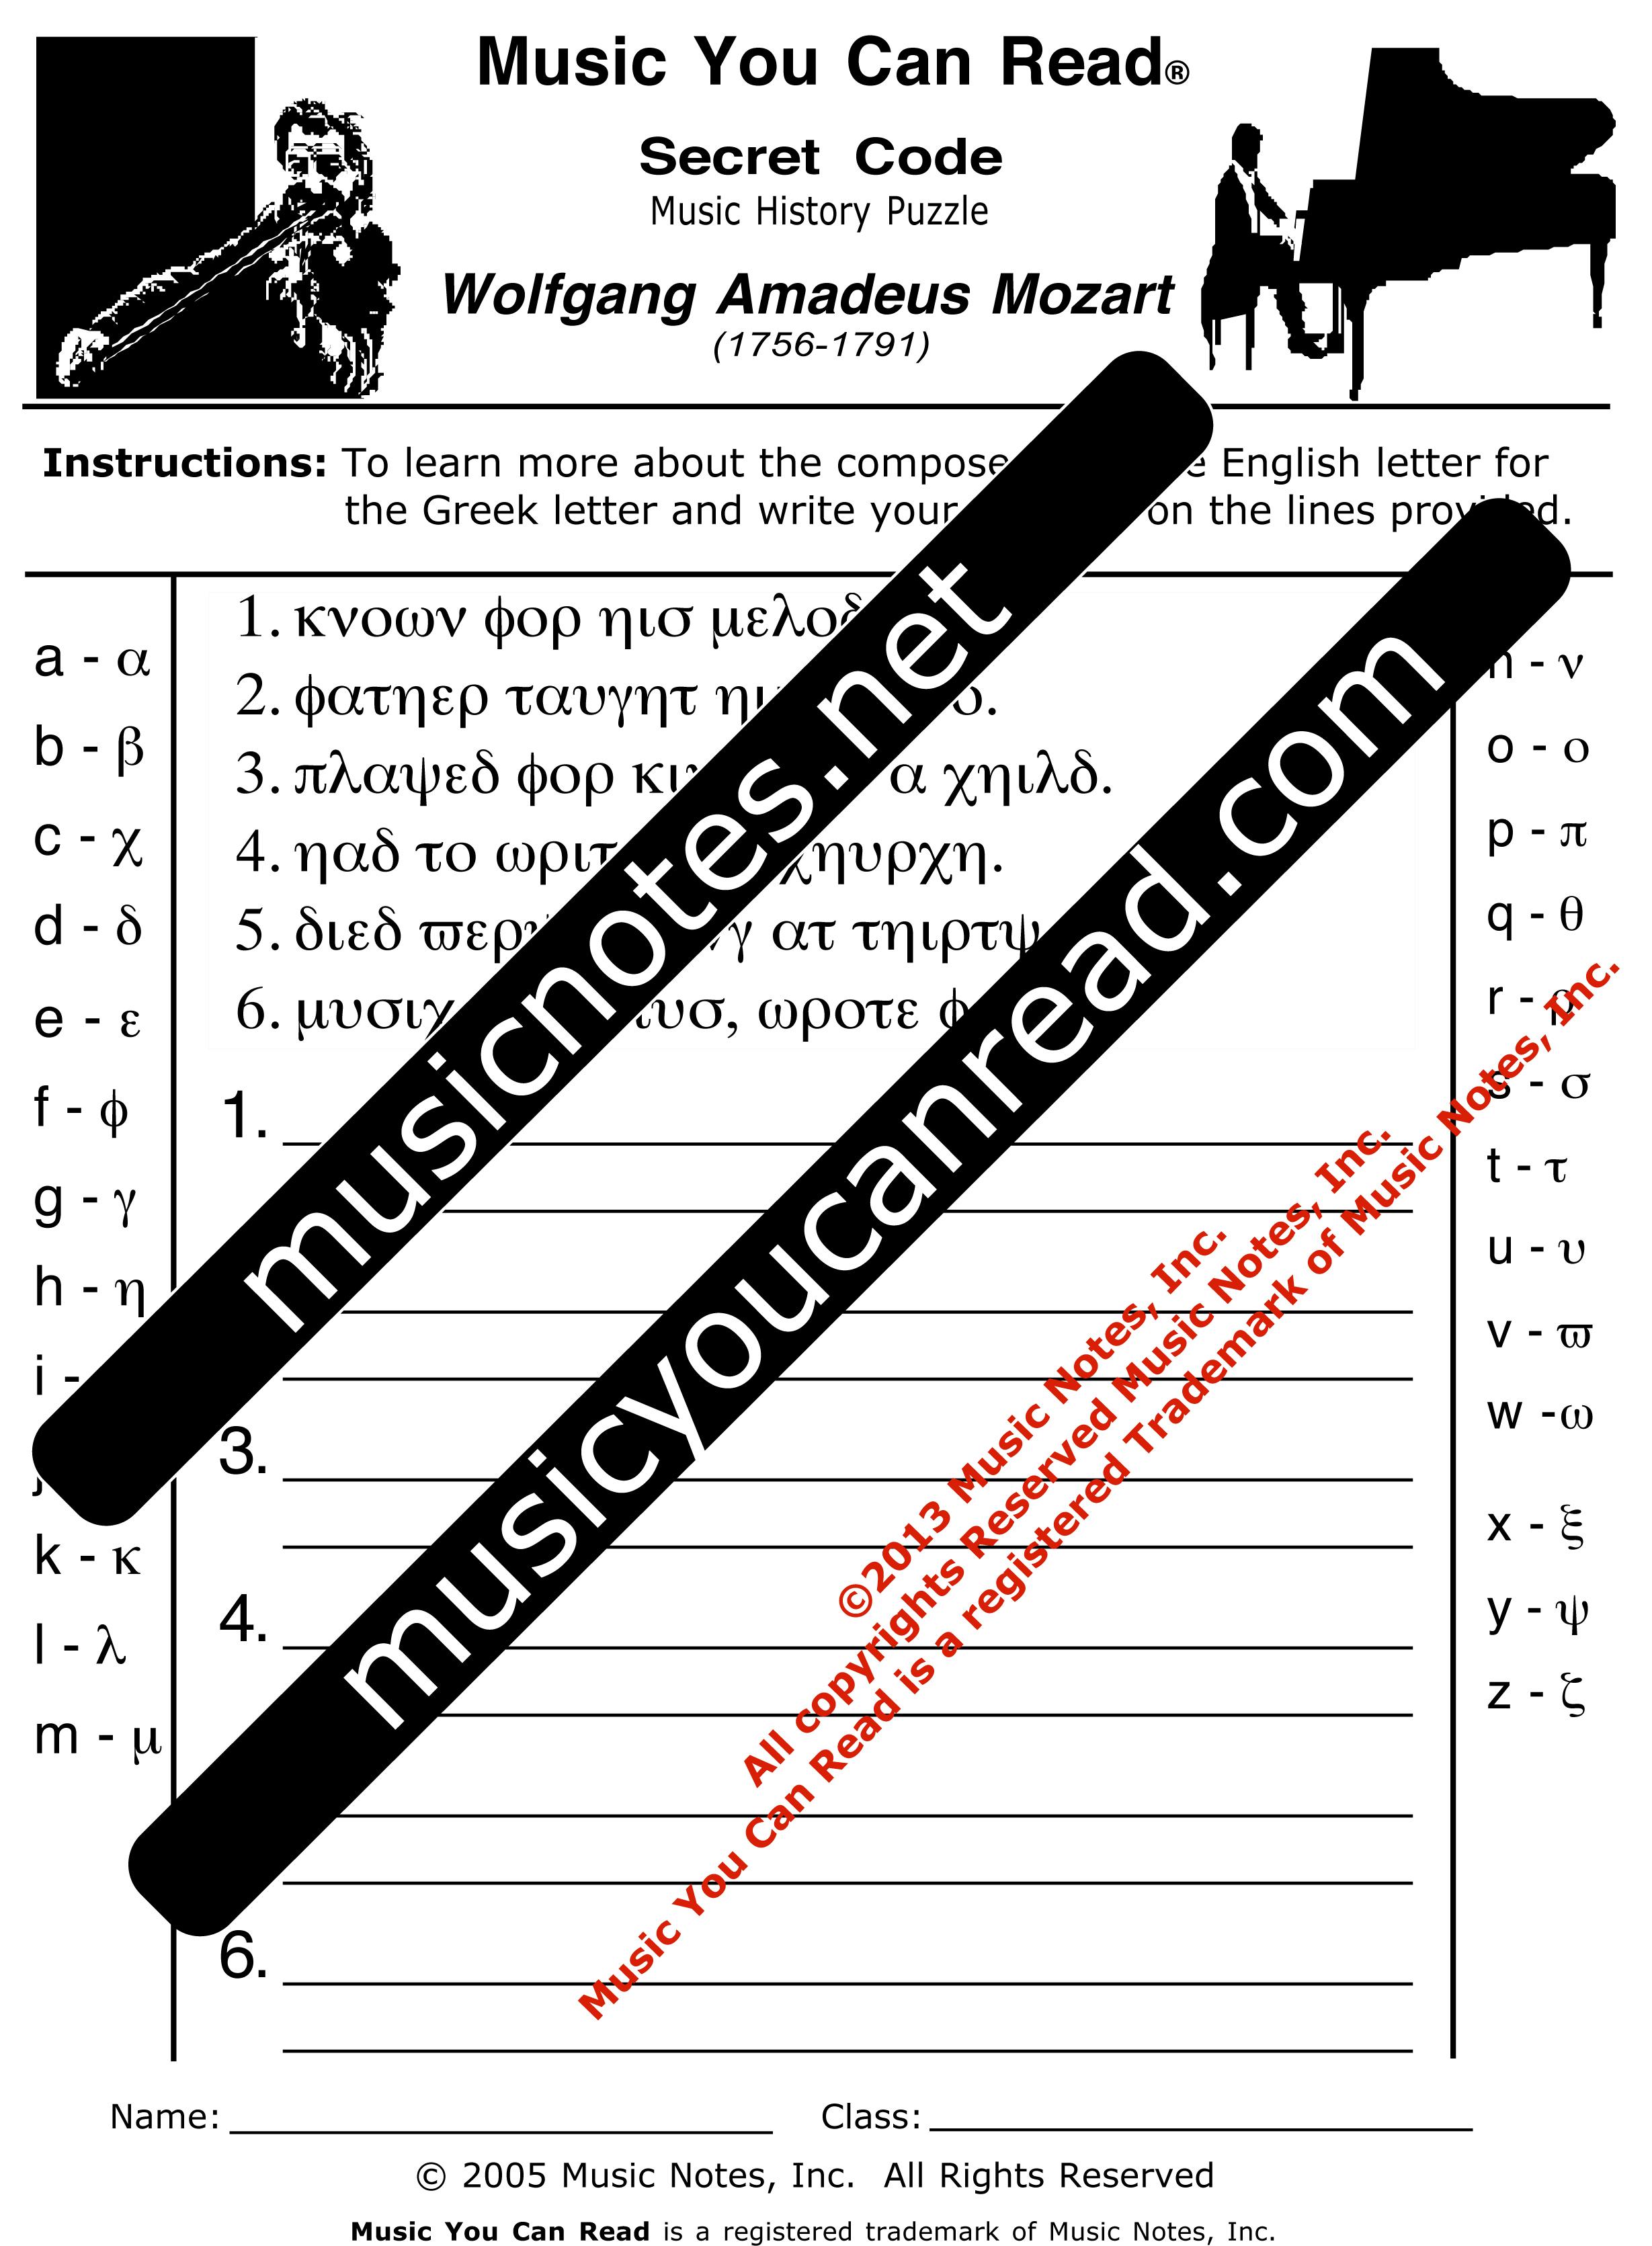 Secret Code – Wolfgang Amadeus Mozart